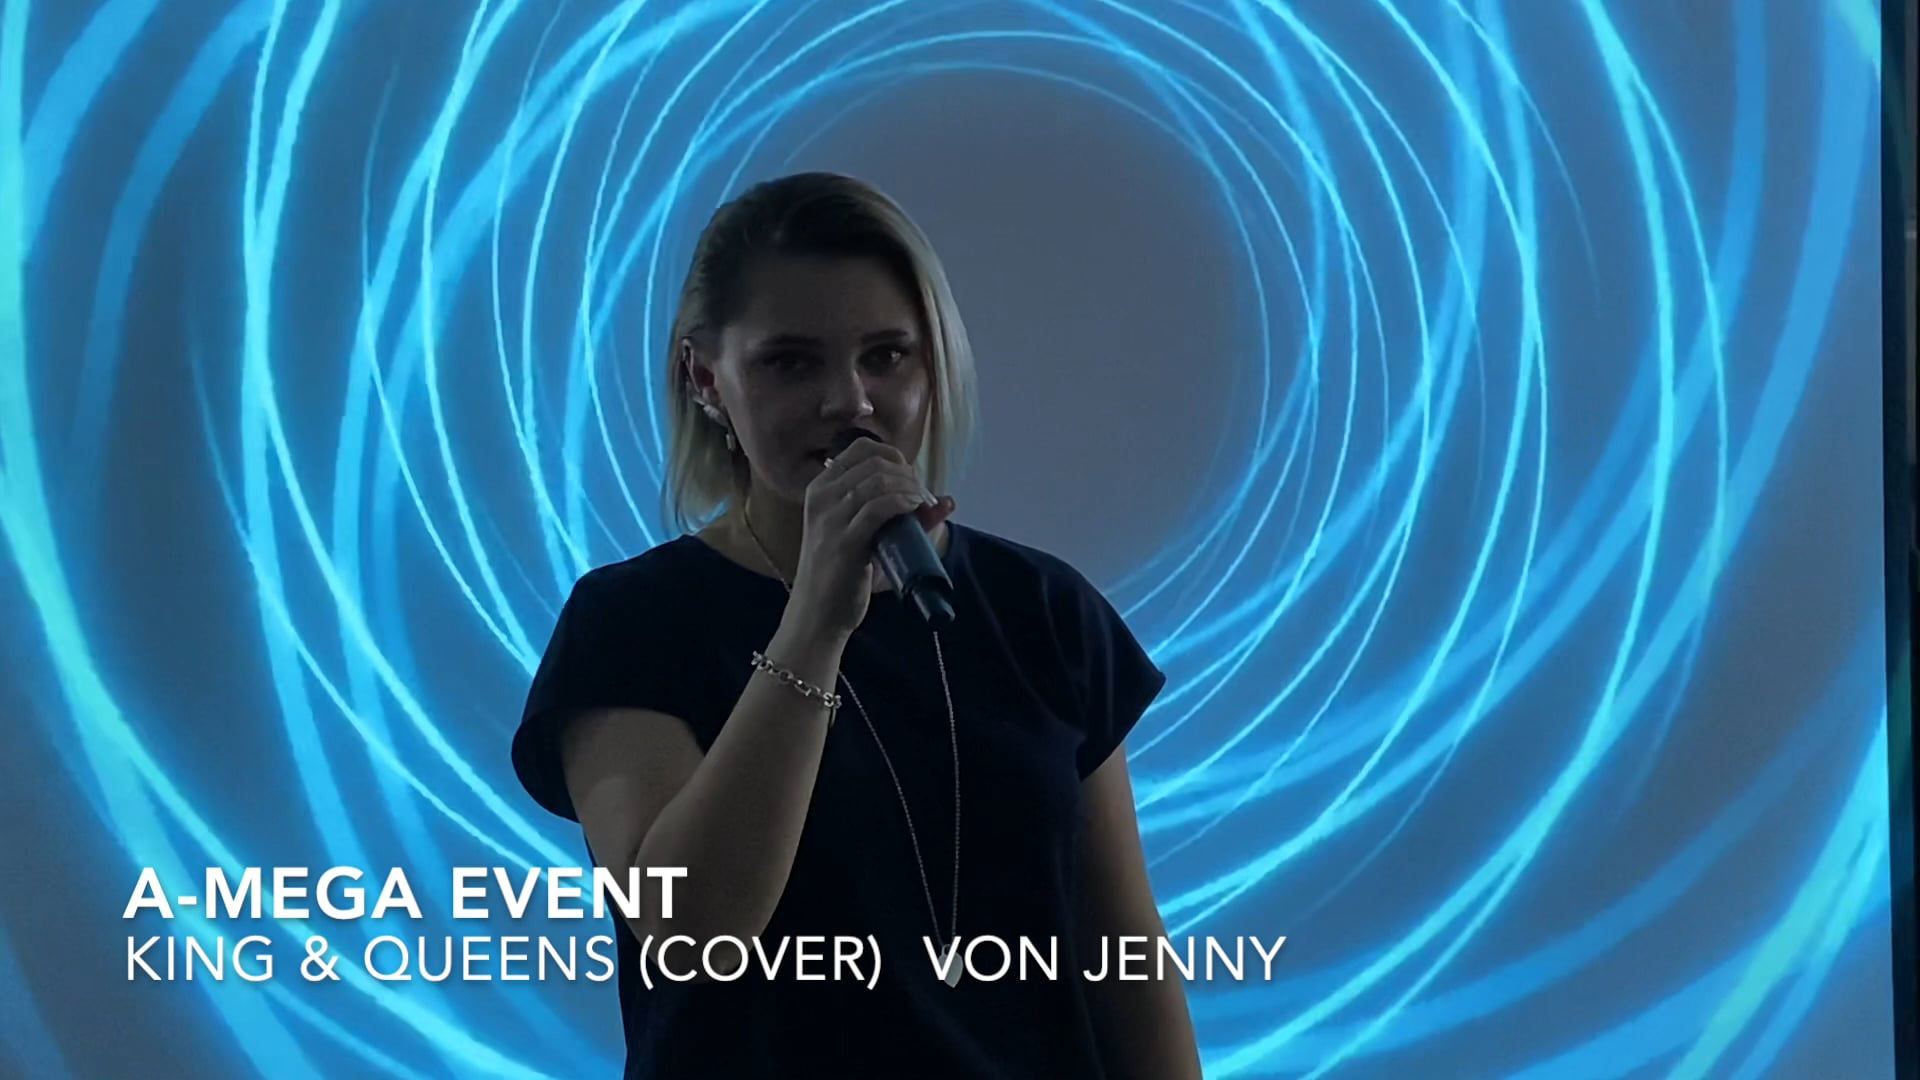 King & Queen Cover A-Mega Event